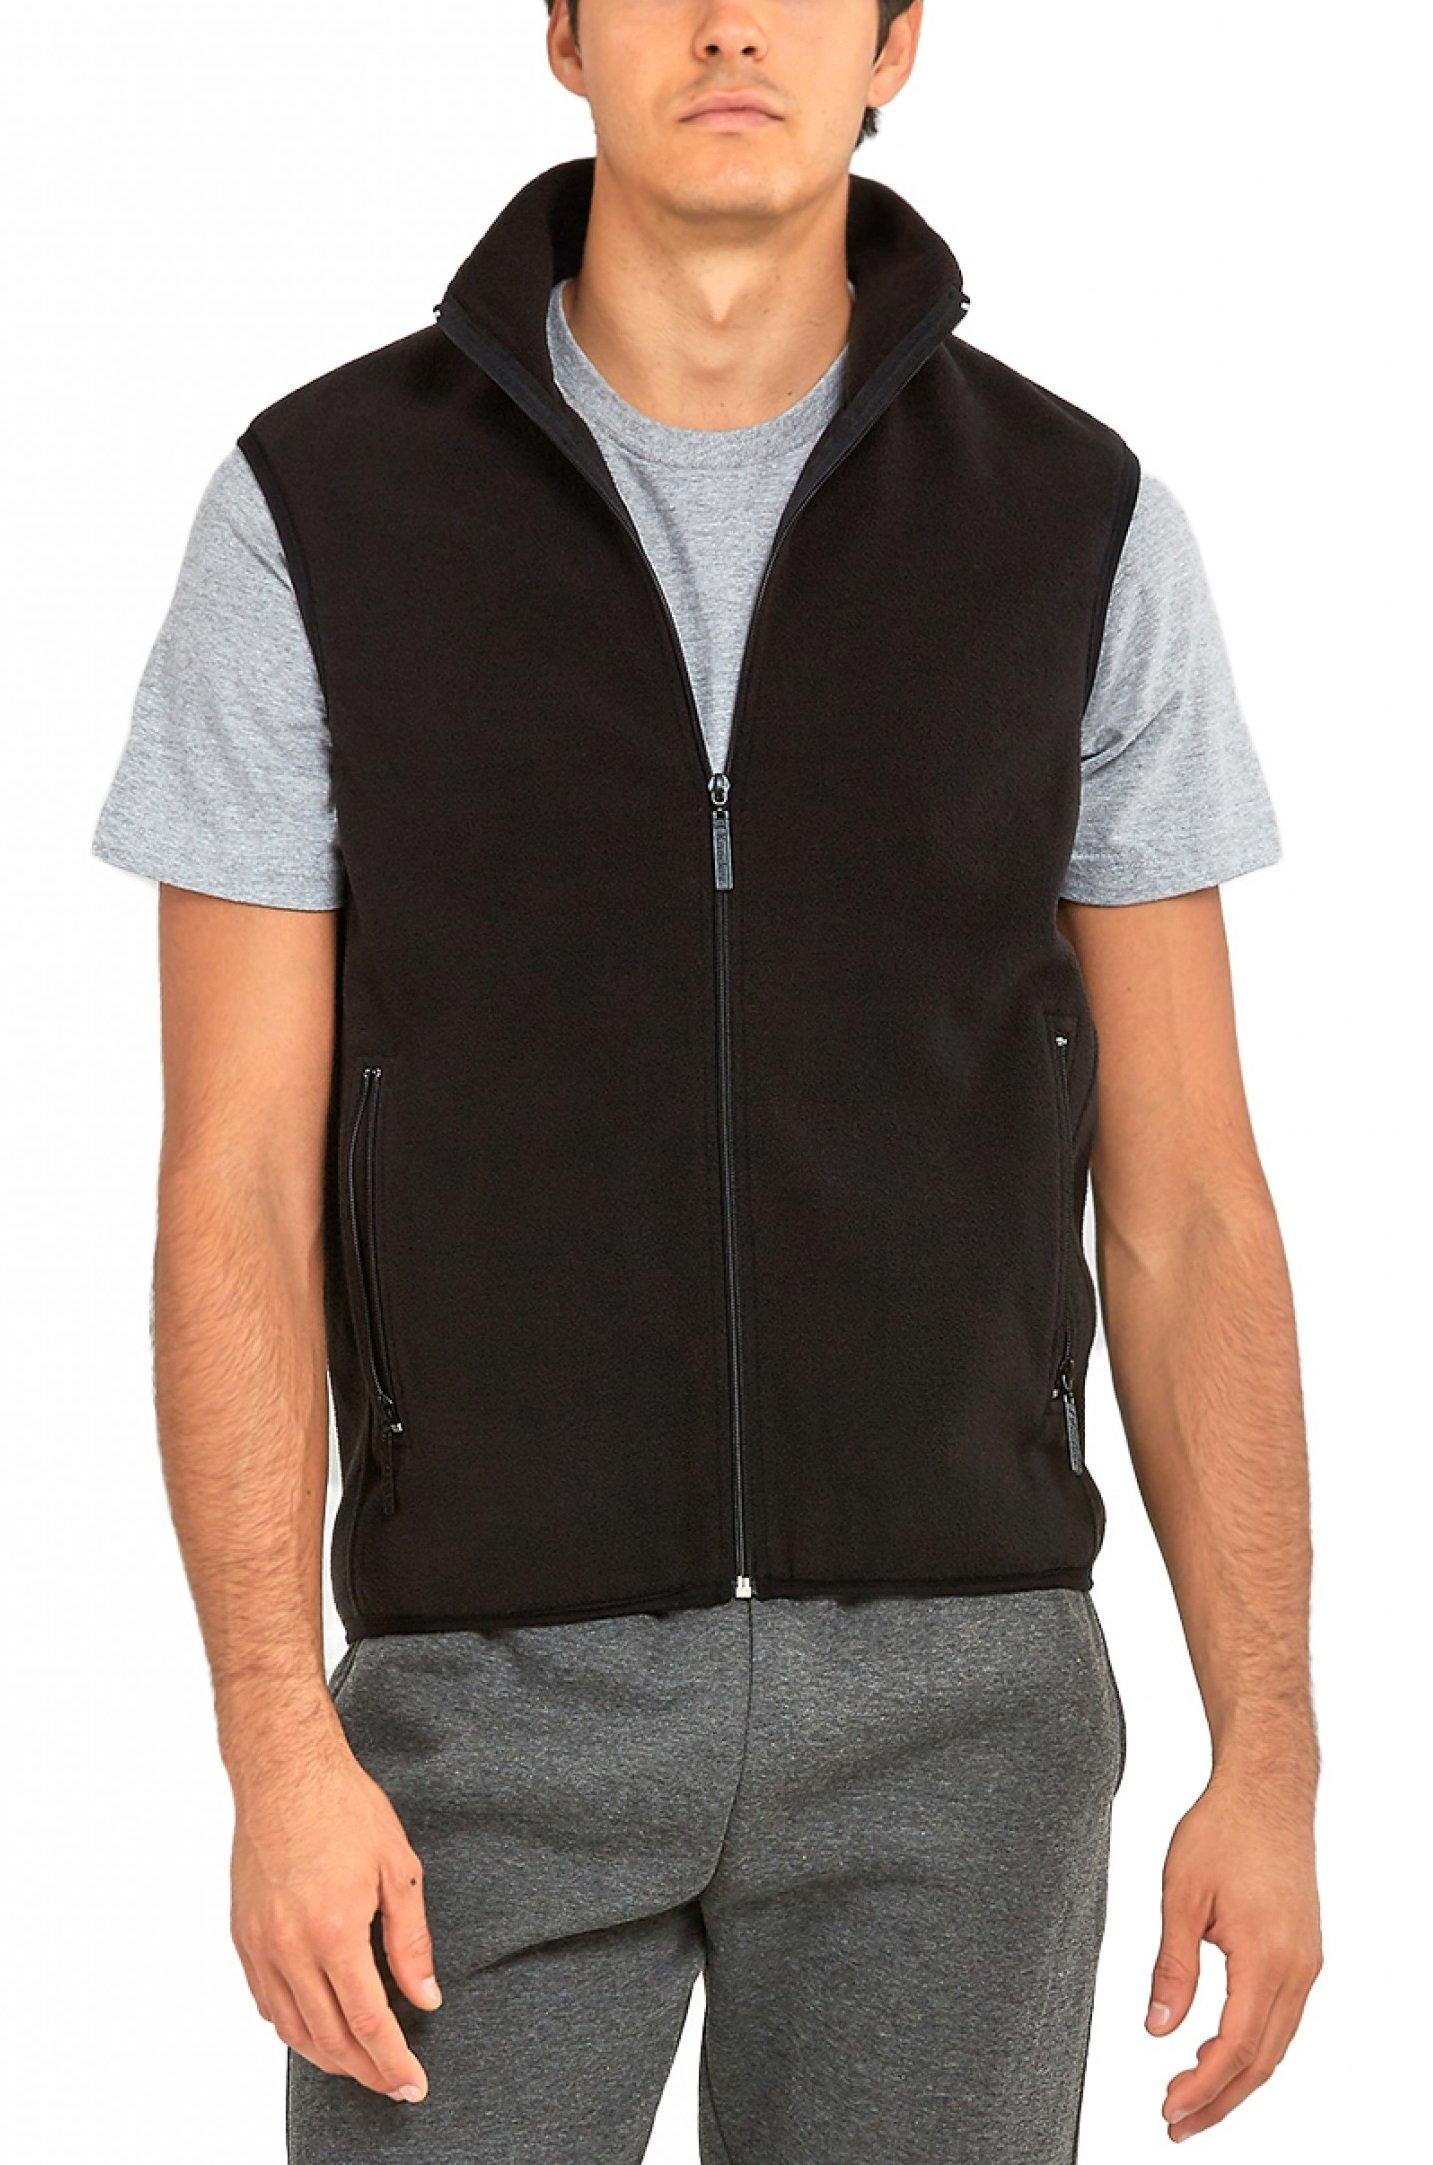 ToBeInStyle Men's Zipup Sleevless High Collar Polar Fleece Vest - Black - XL